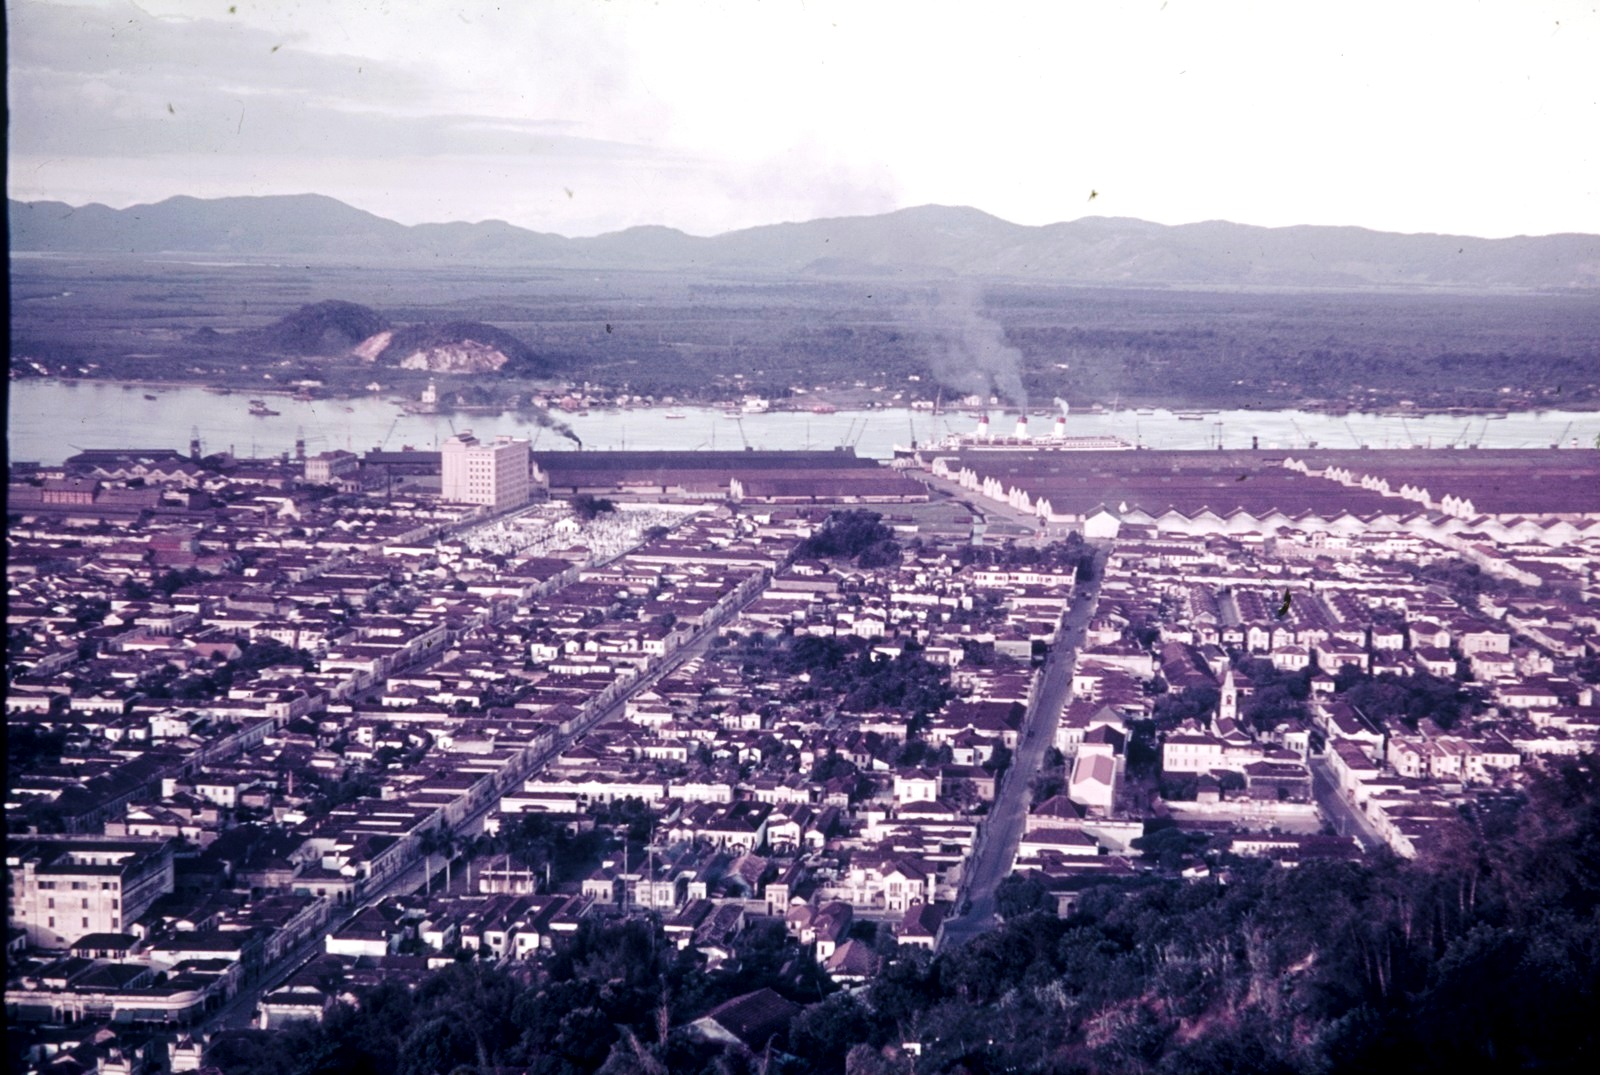 Сантус. Панорама города и гавани со вставшей на «Cap Arcona»